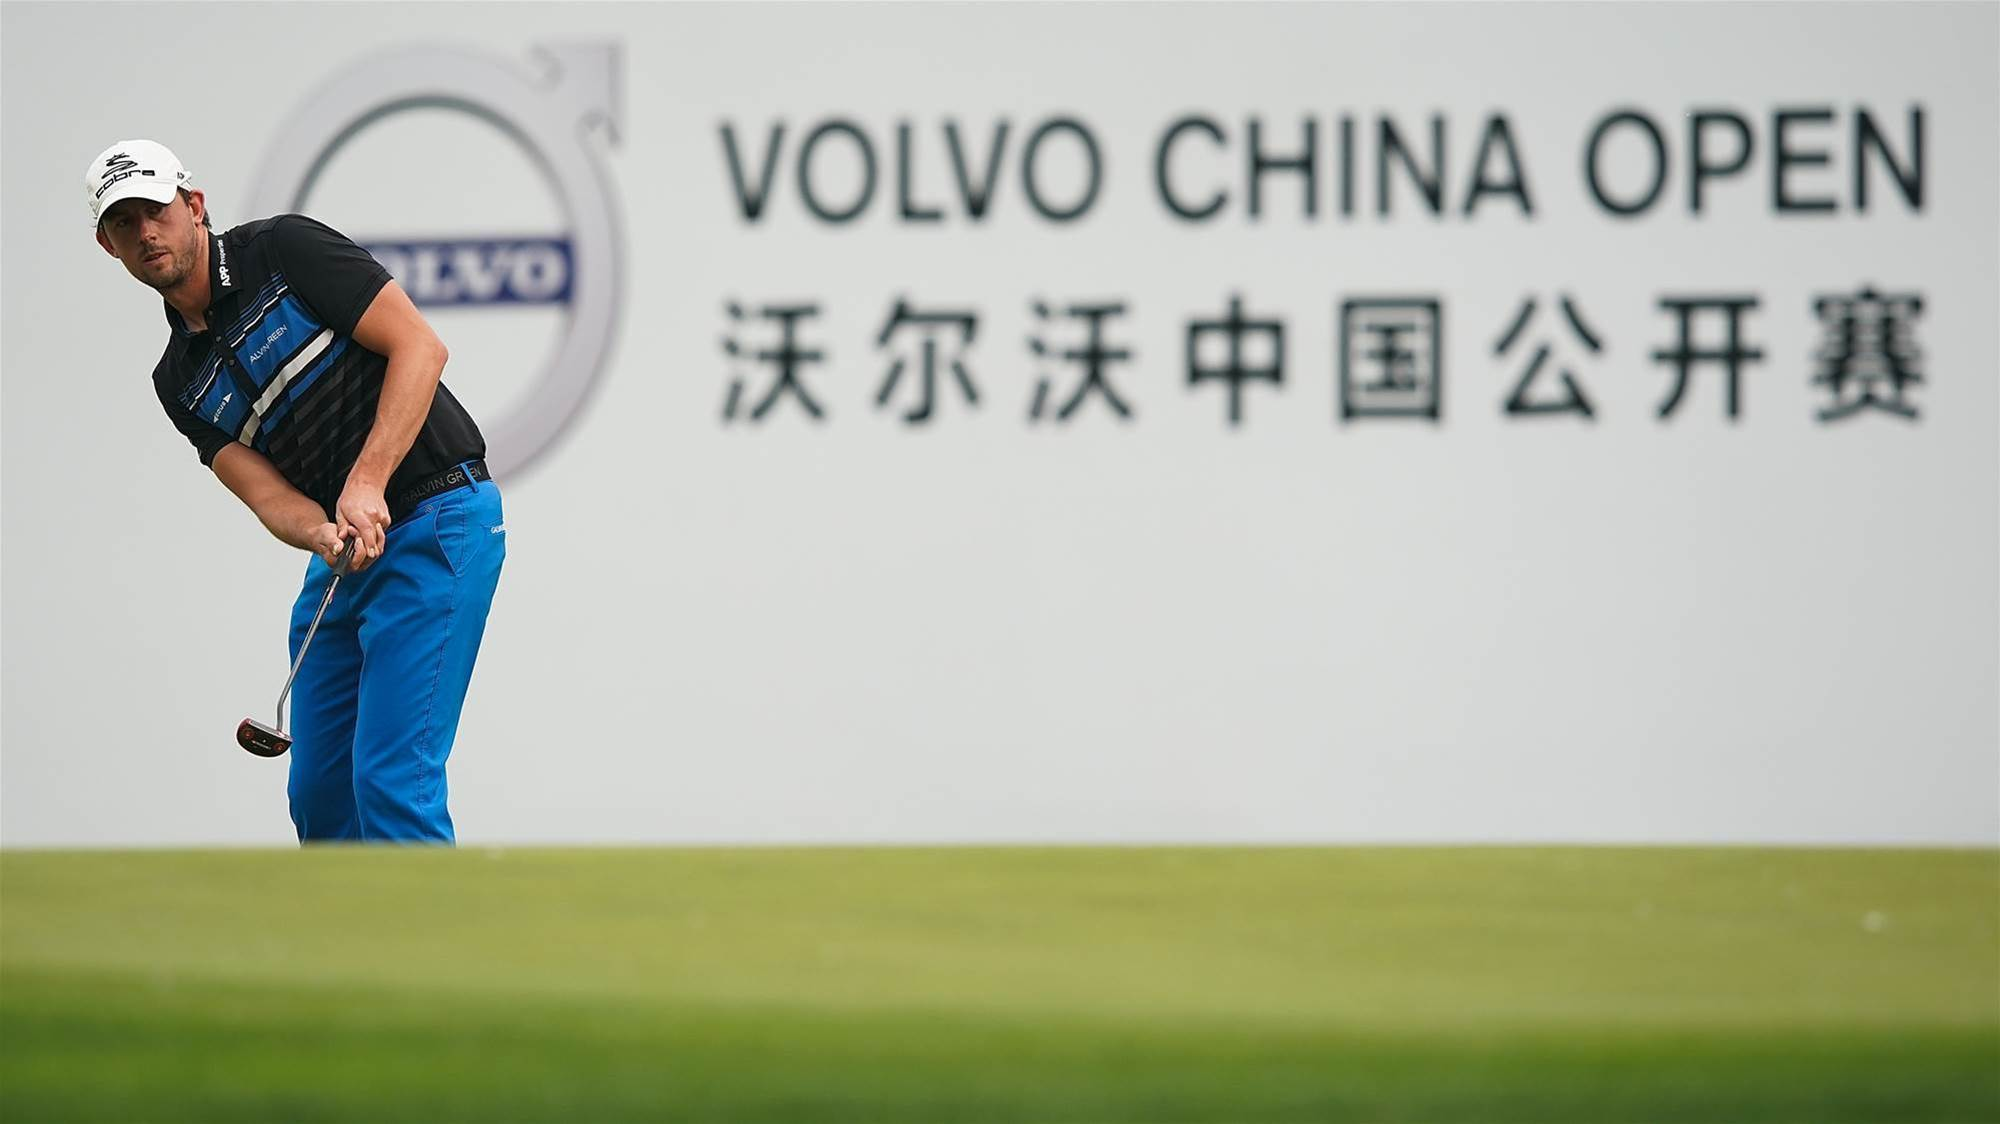 European & Asian Tours sanction China Open